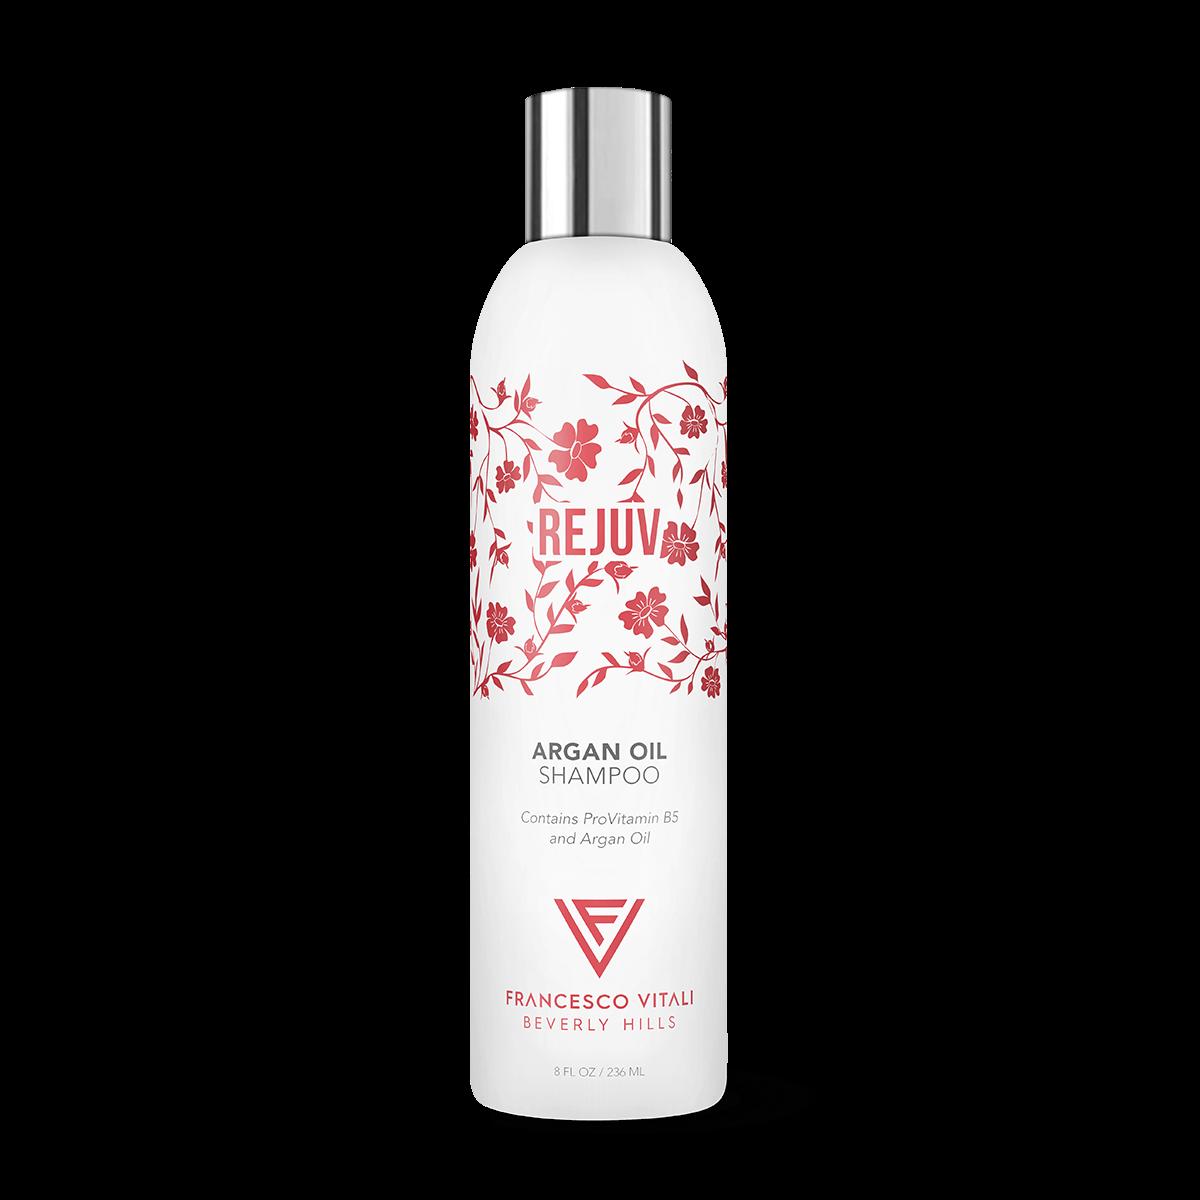 Rejuv Argan Oil Shampoo